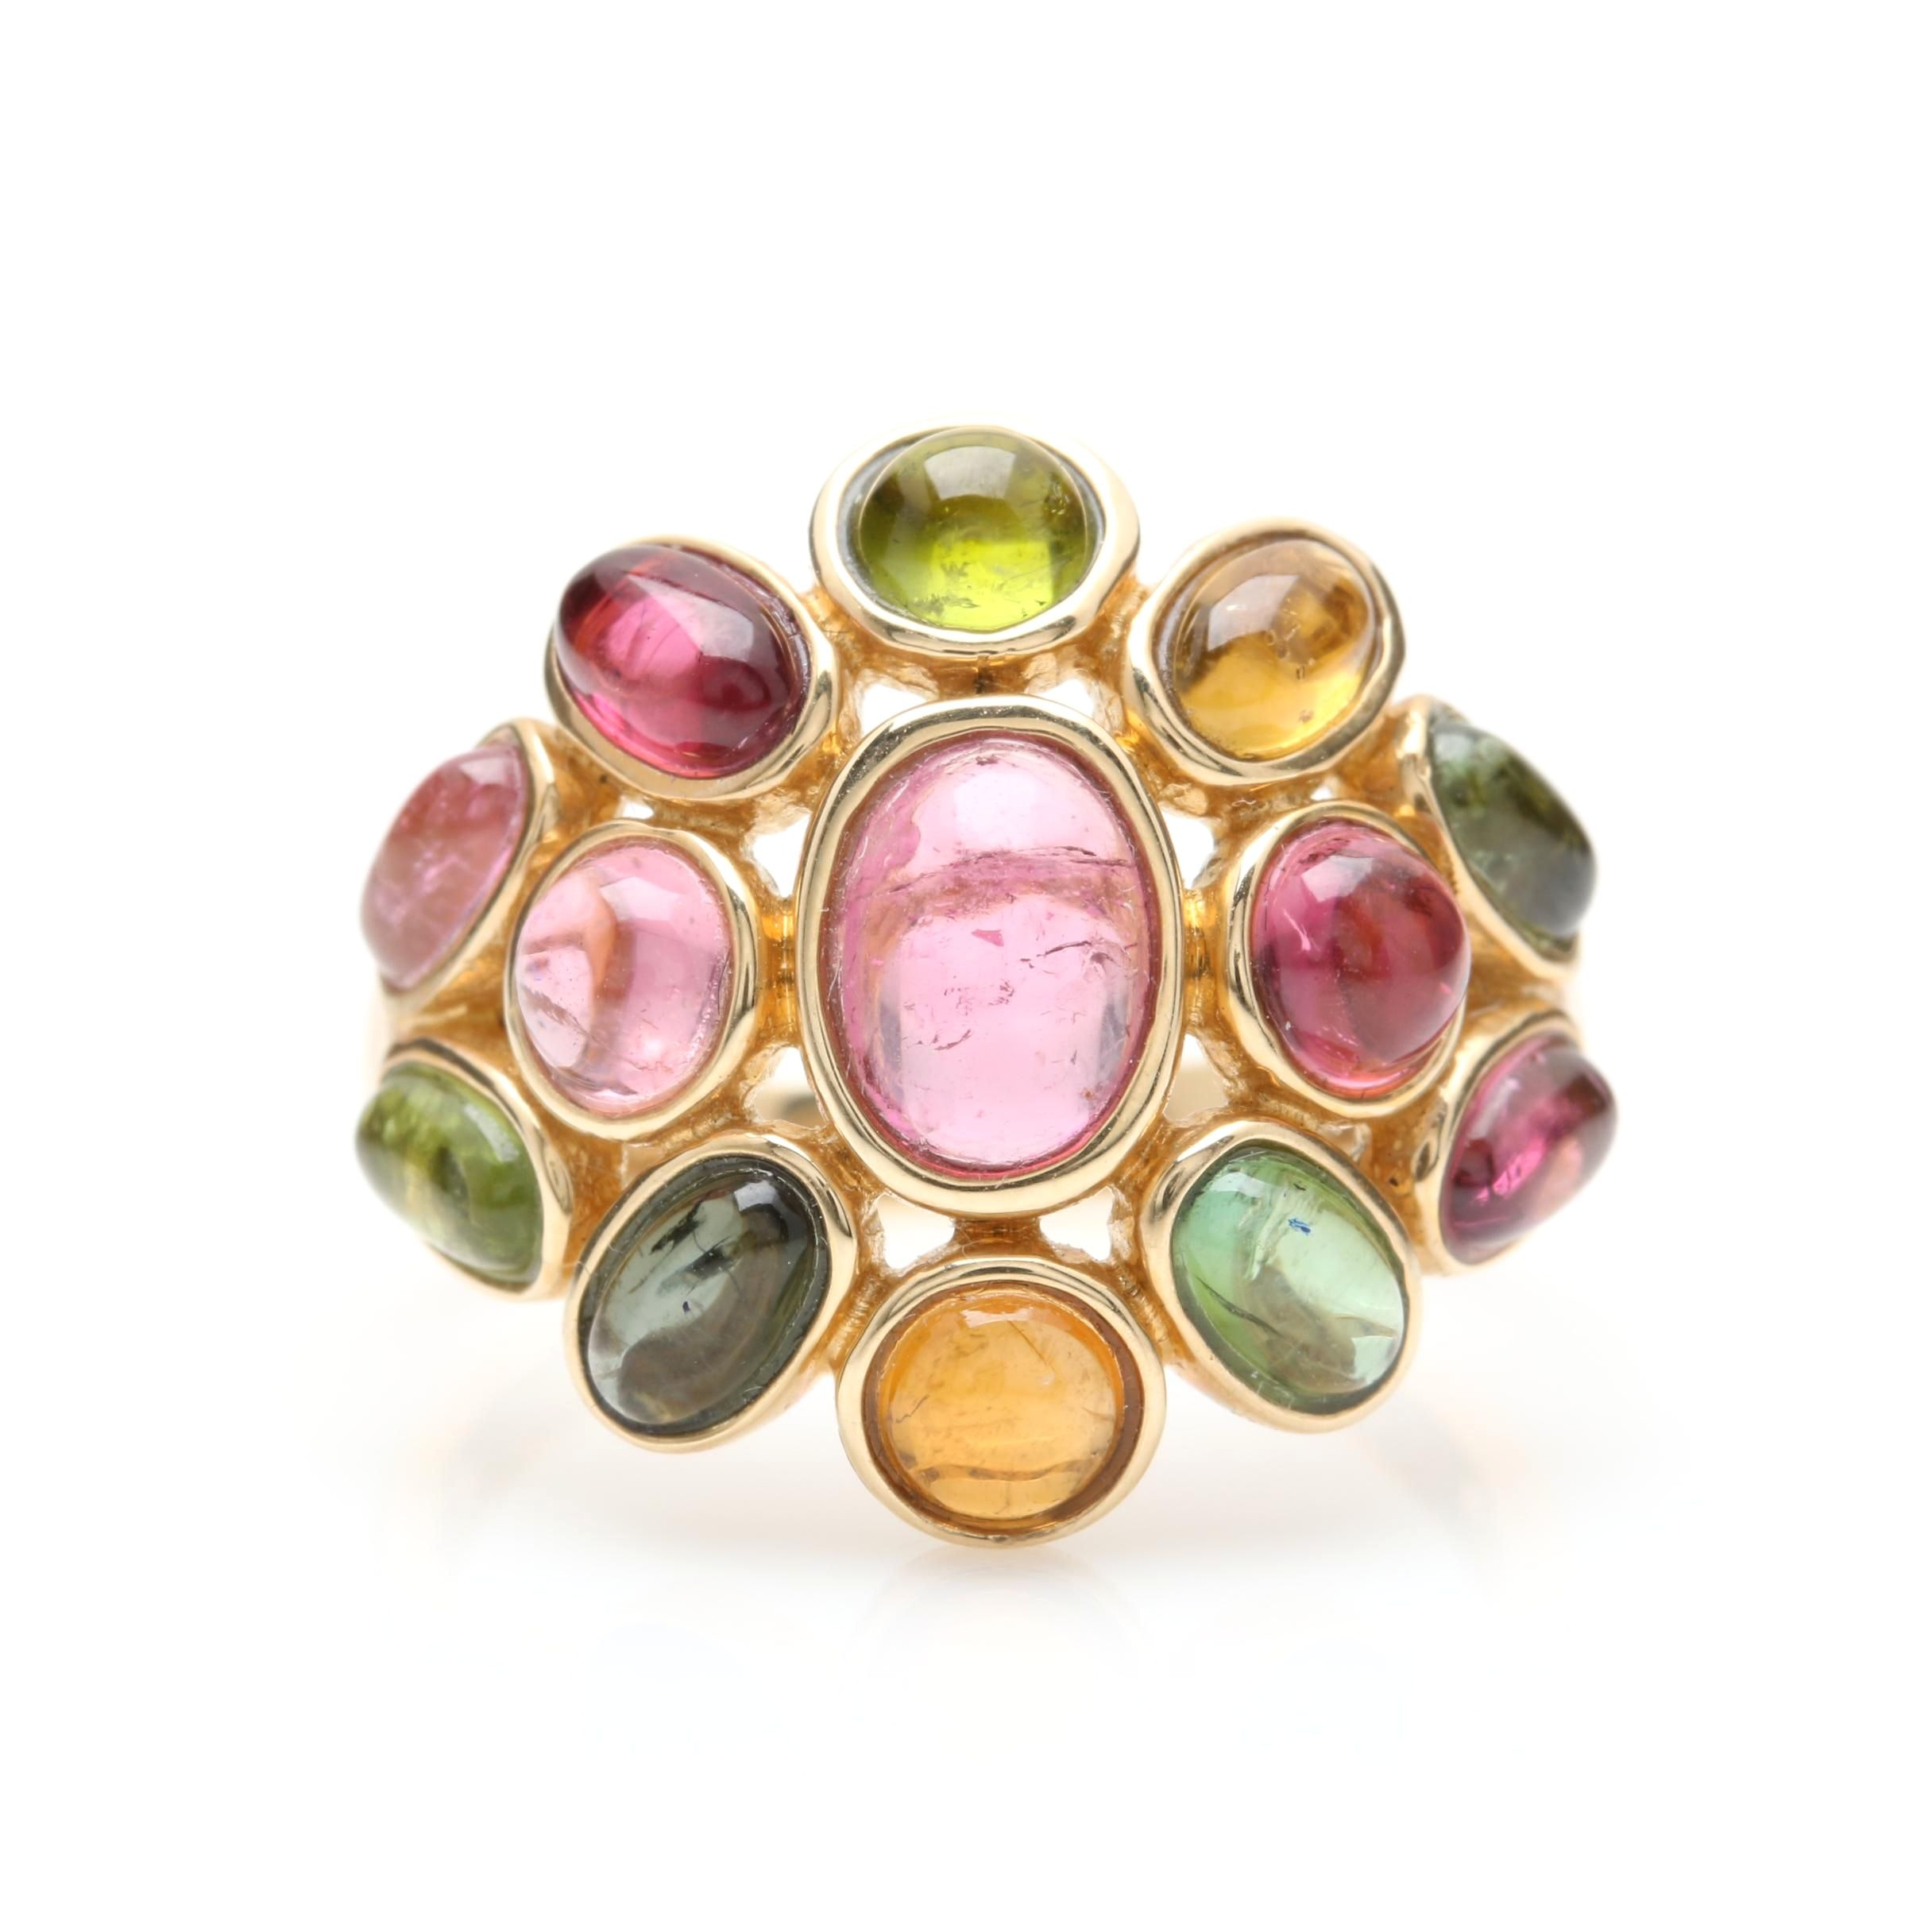 14K Yellow Gold Pink Tourmaline, Green Tourmaline, and Citrine Ring